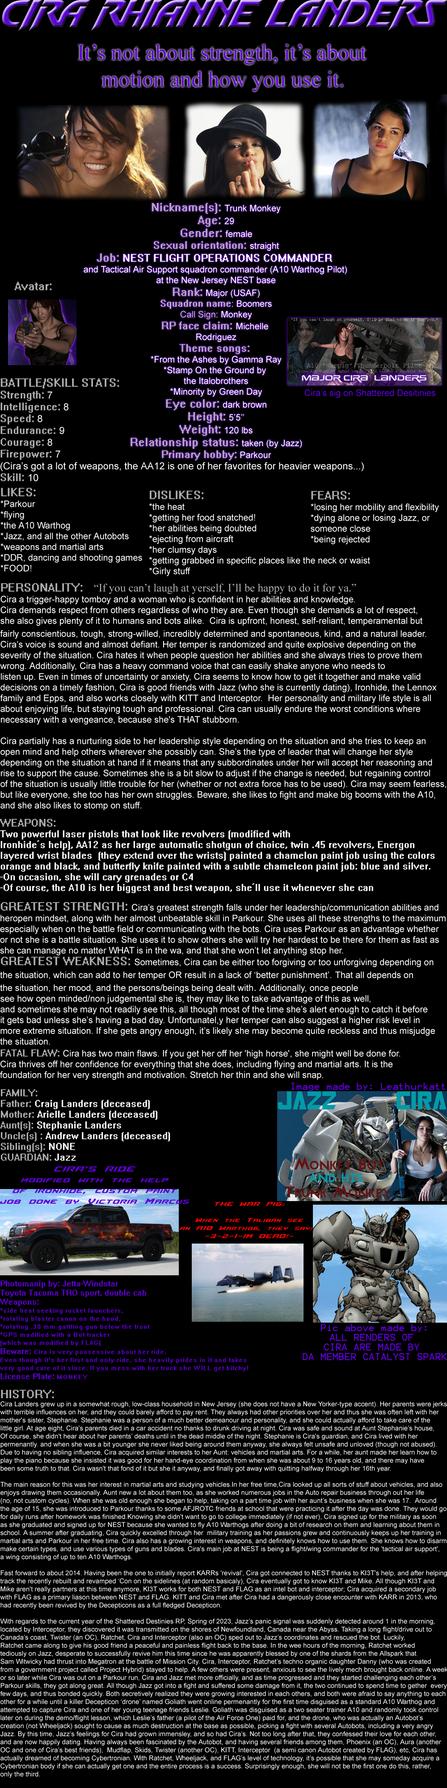 Cira Landers Image Profile by Jetta-Windstar